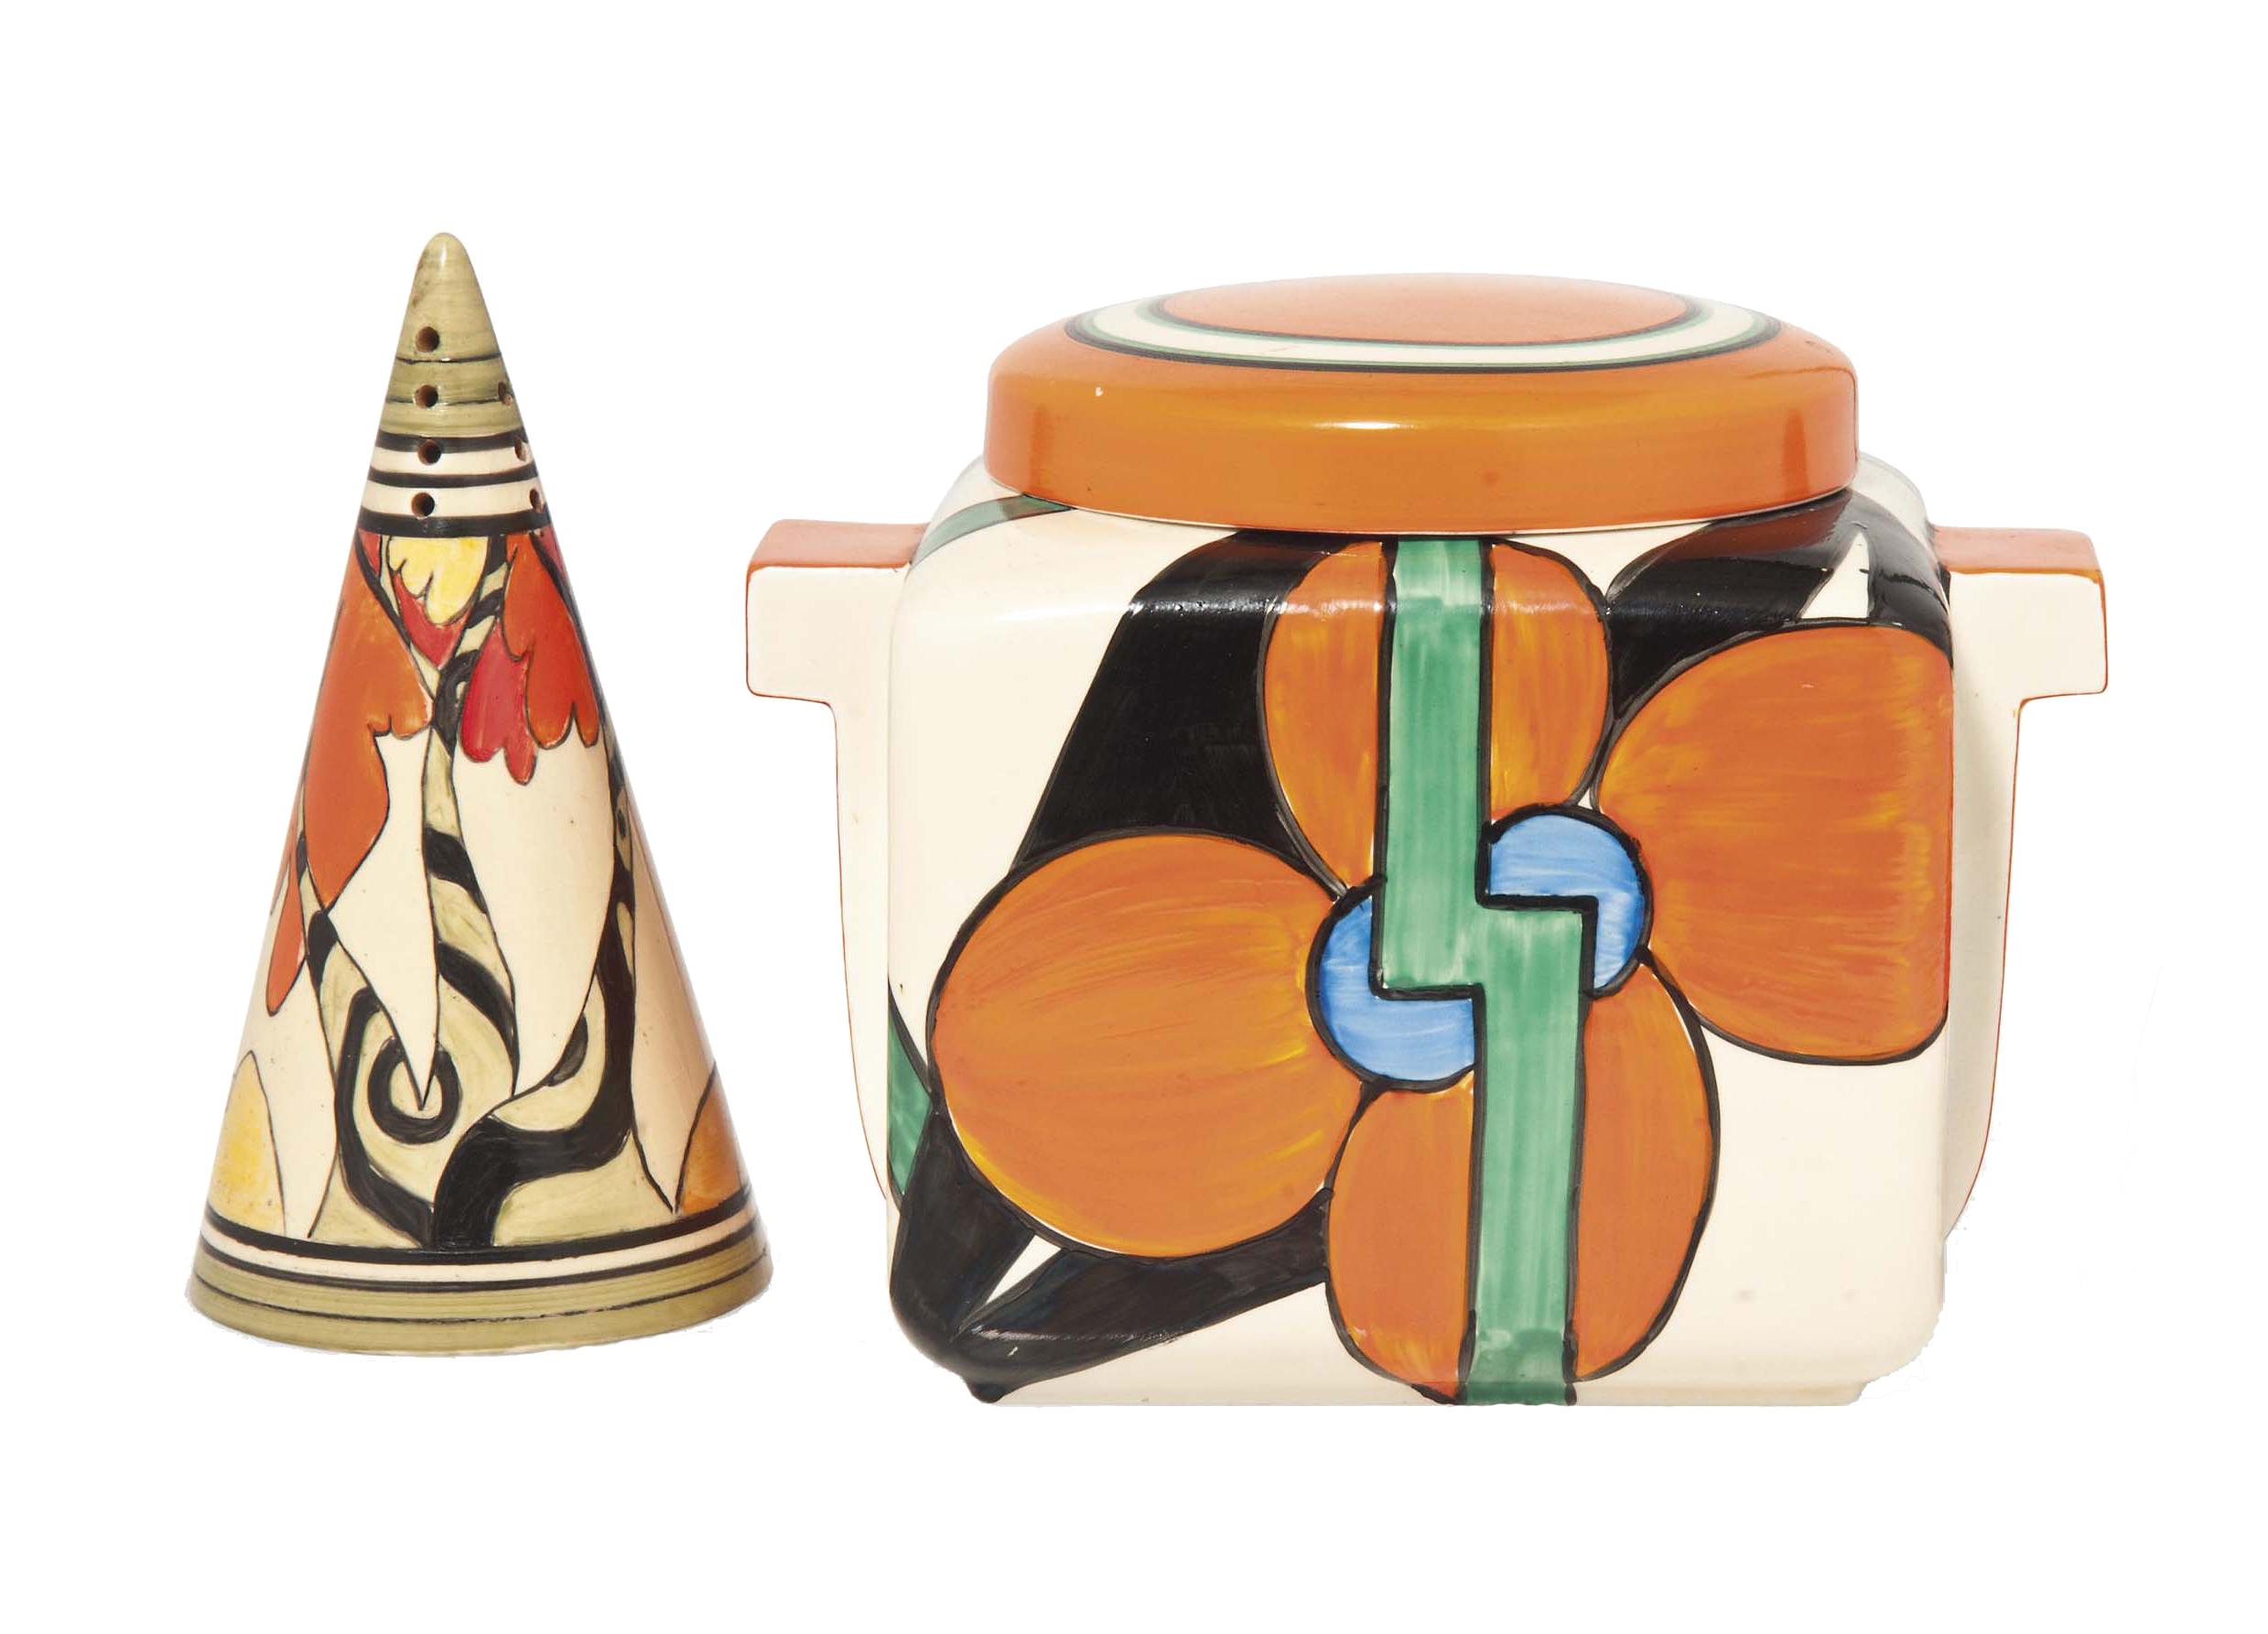 A CLARICE CLIFF (1899-1972) 'O